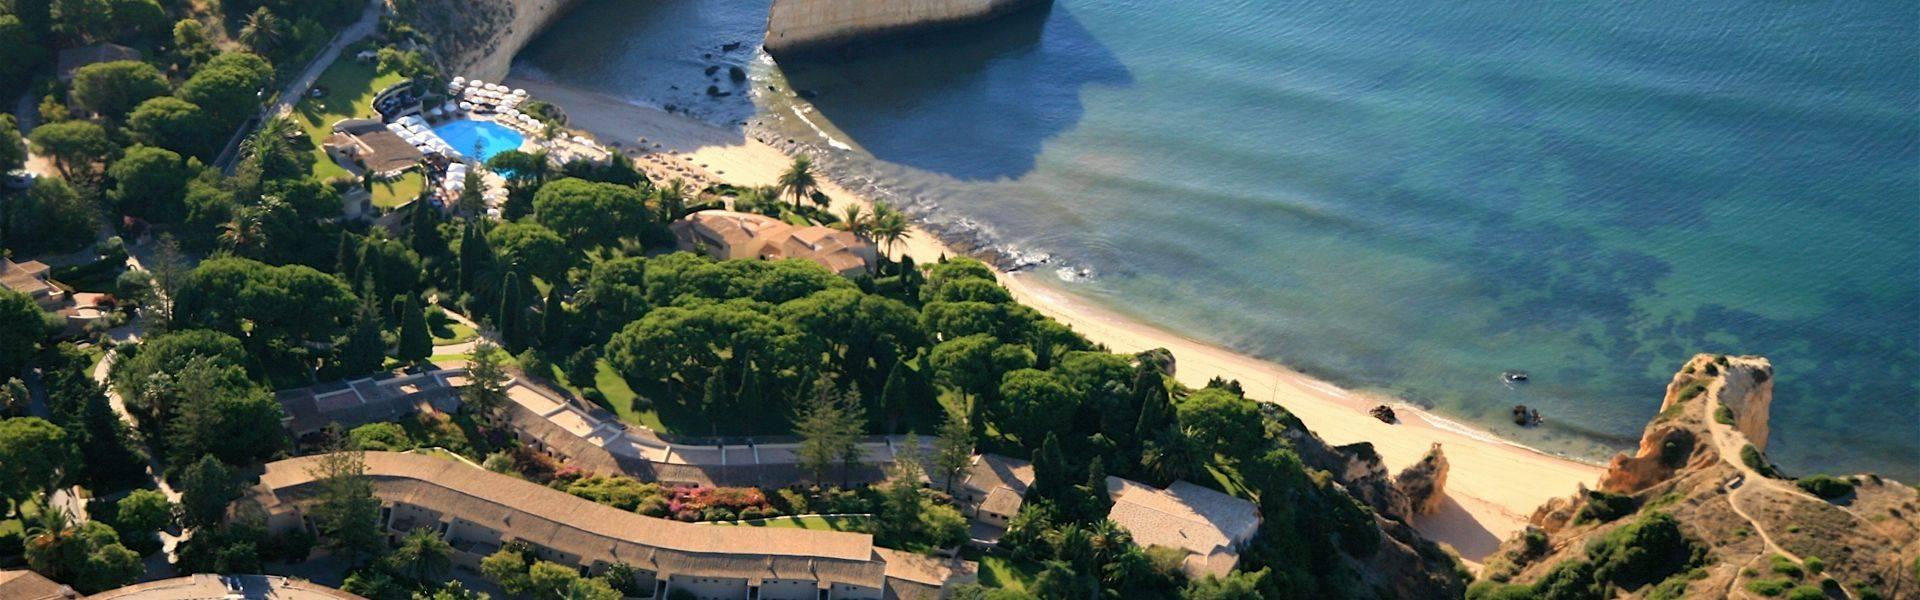 Vilalara-Thalassa-Resort-Aerial-View.jpg